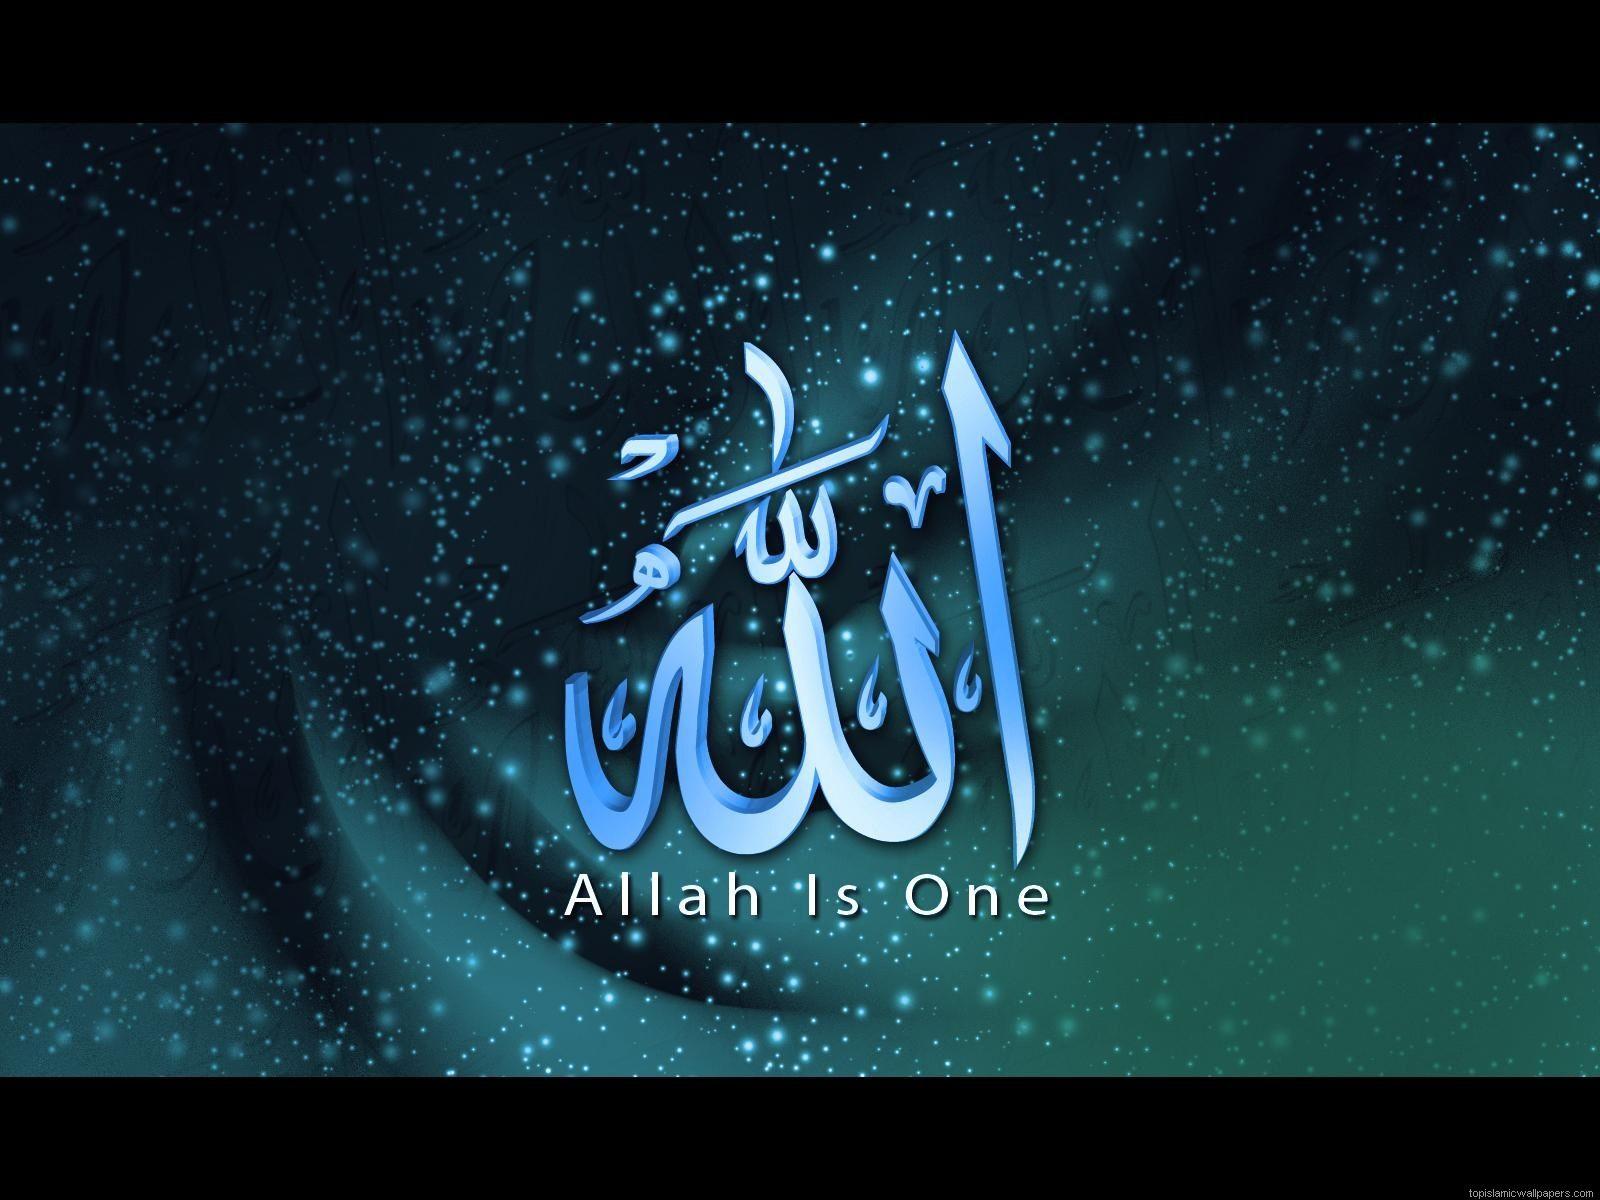 Best Wallpaper Name Arabic - 67a92f808b6ae2673dda6c69b3ca0798  2018_776291.jpg